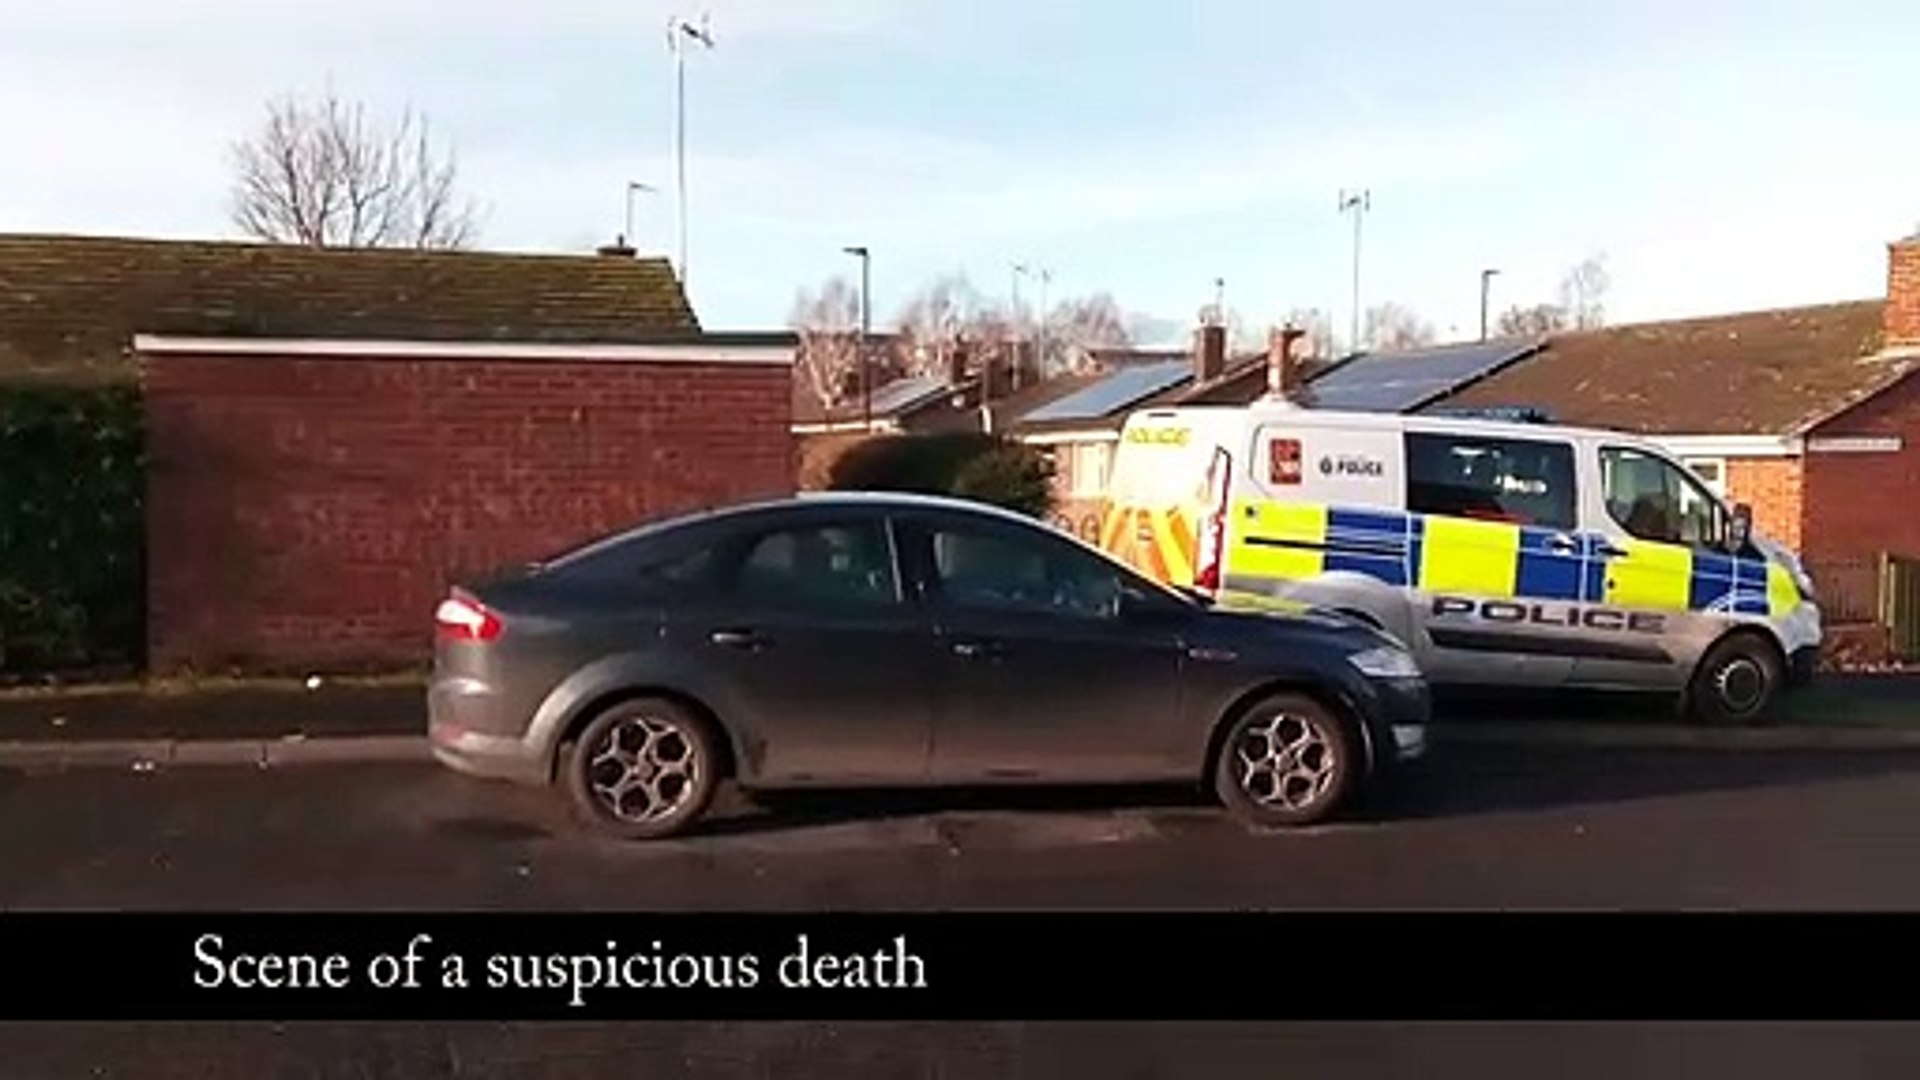 'Suspicious' death at Denaby Main, Doncaster